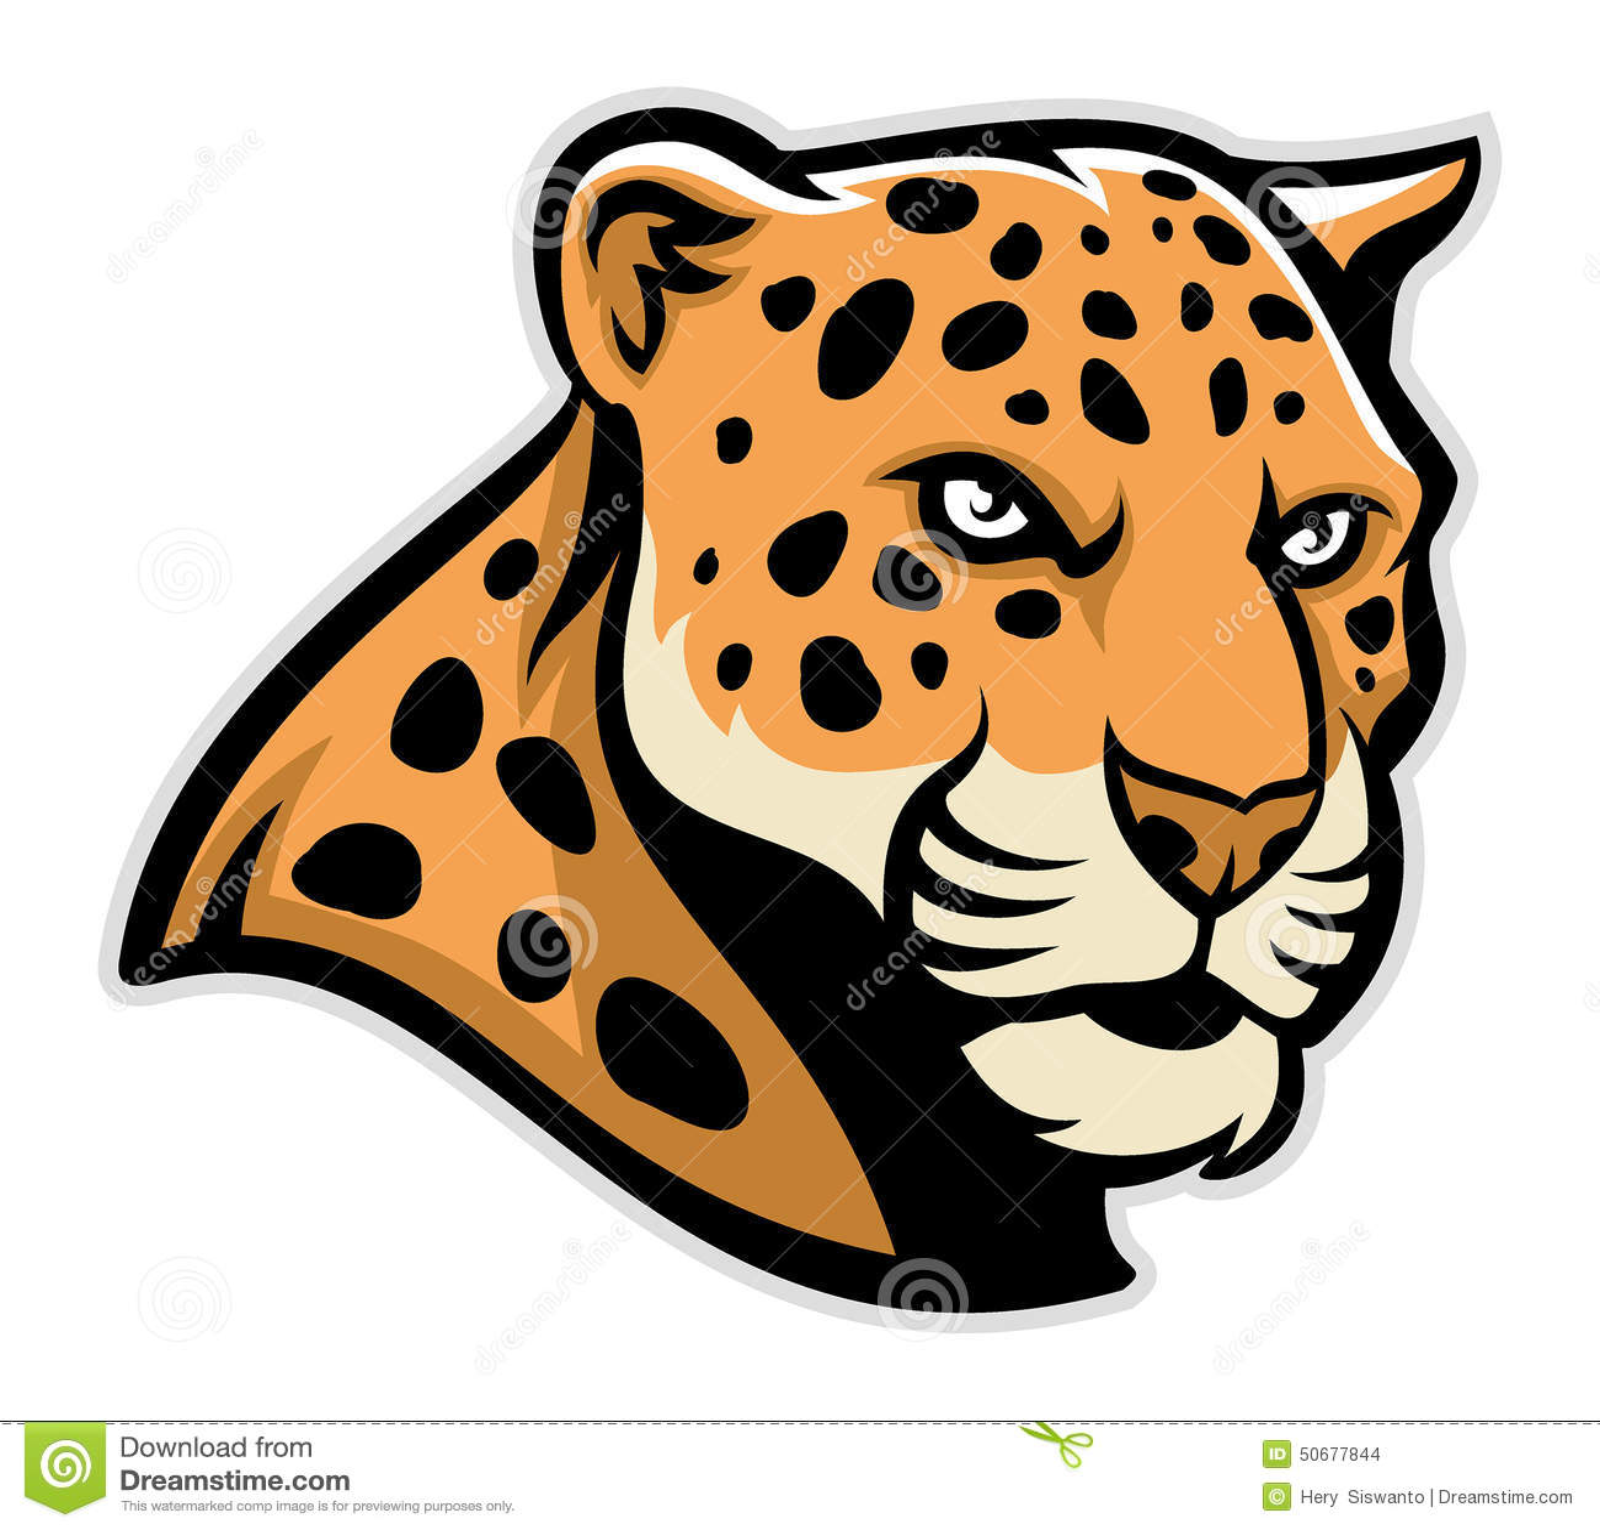 jaguar head mascot stock vector illustration of camouflage 50677844 rh dreamstime com Jaguar Mascot Blue Jaguar Girl Mascot